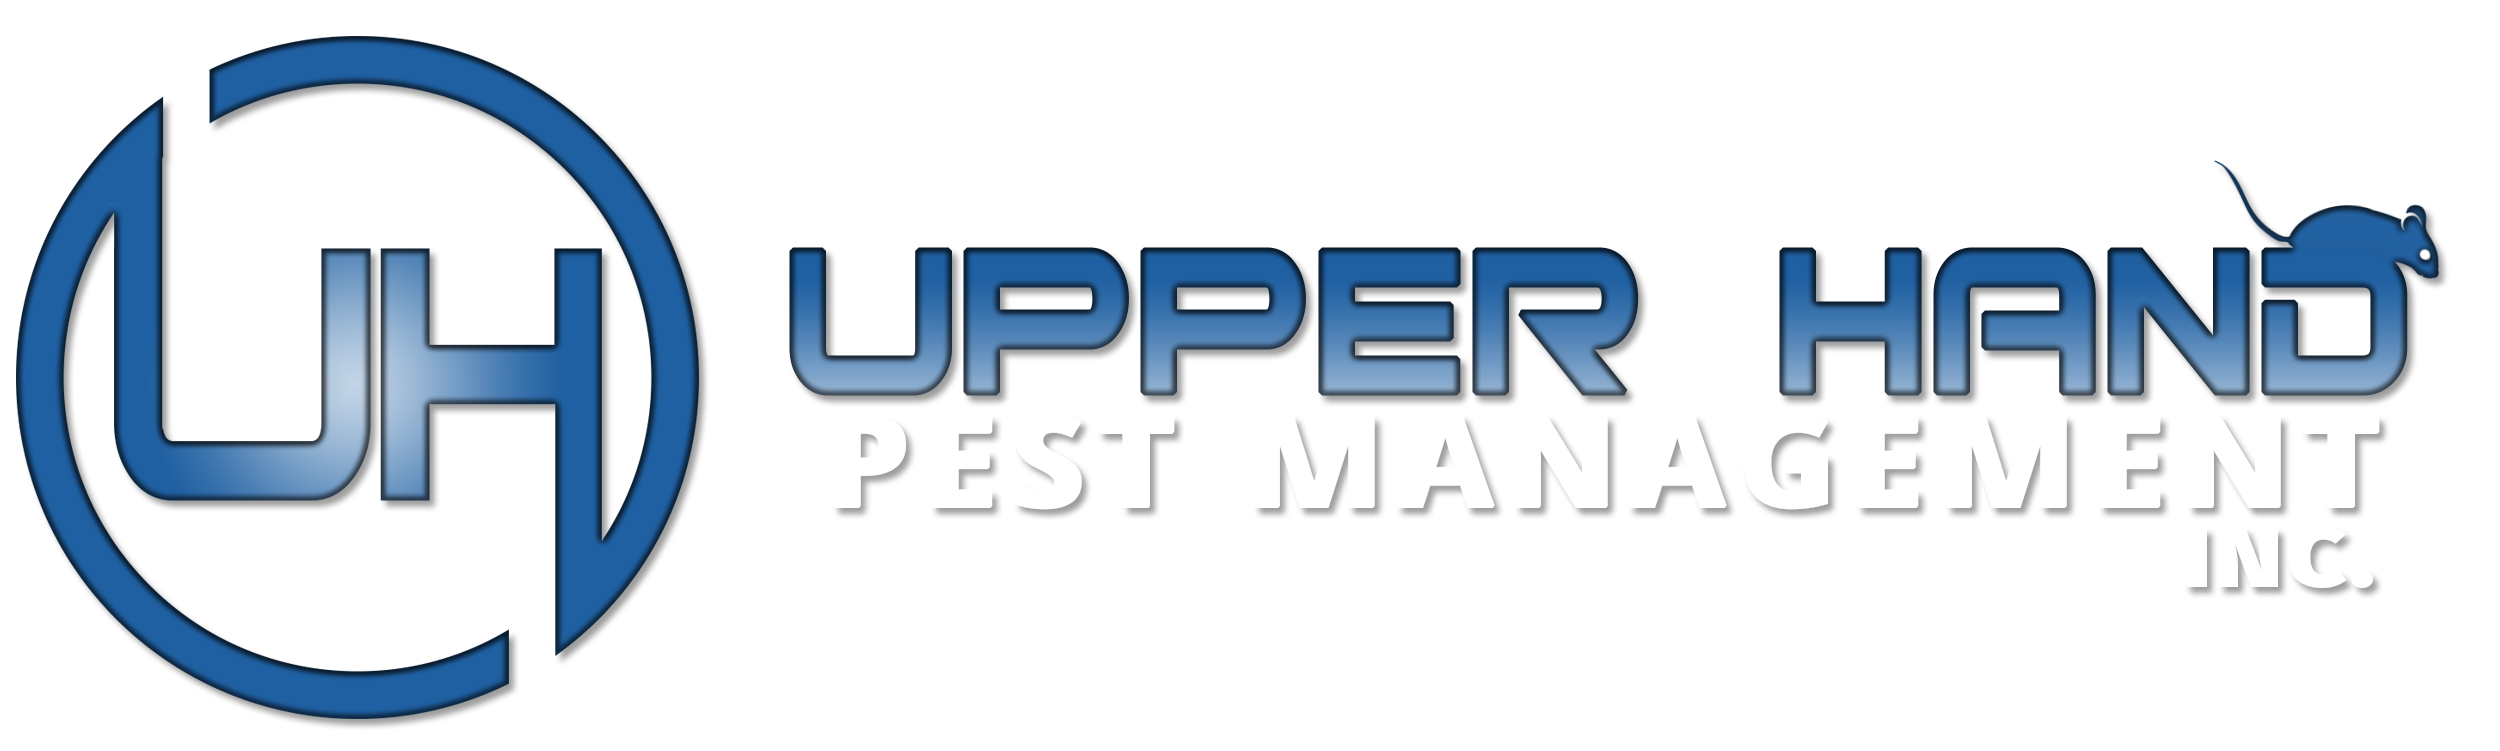 Upper Hand Pest Management WHite Color